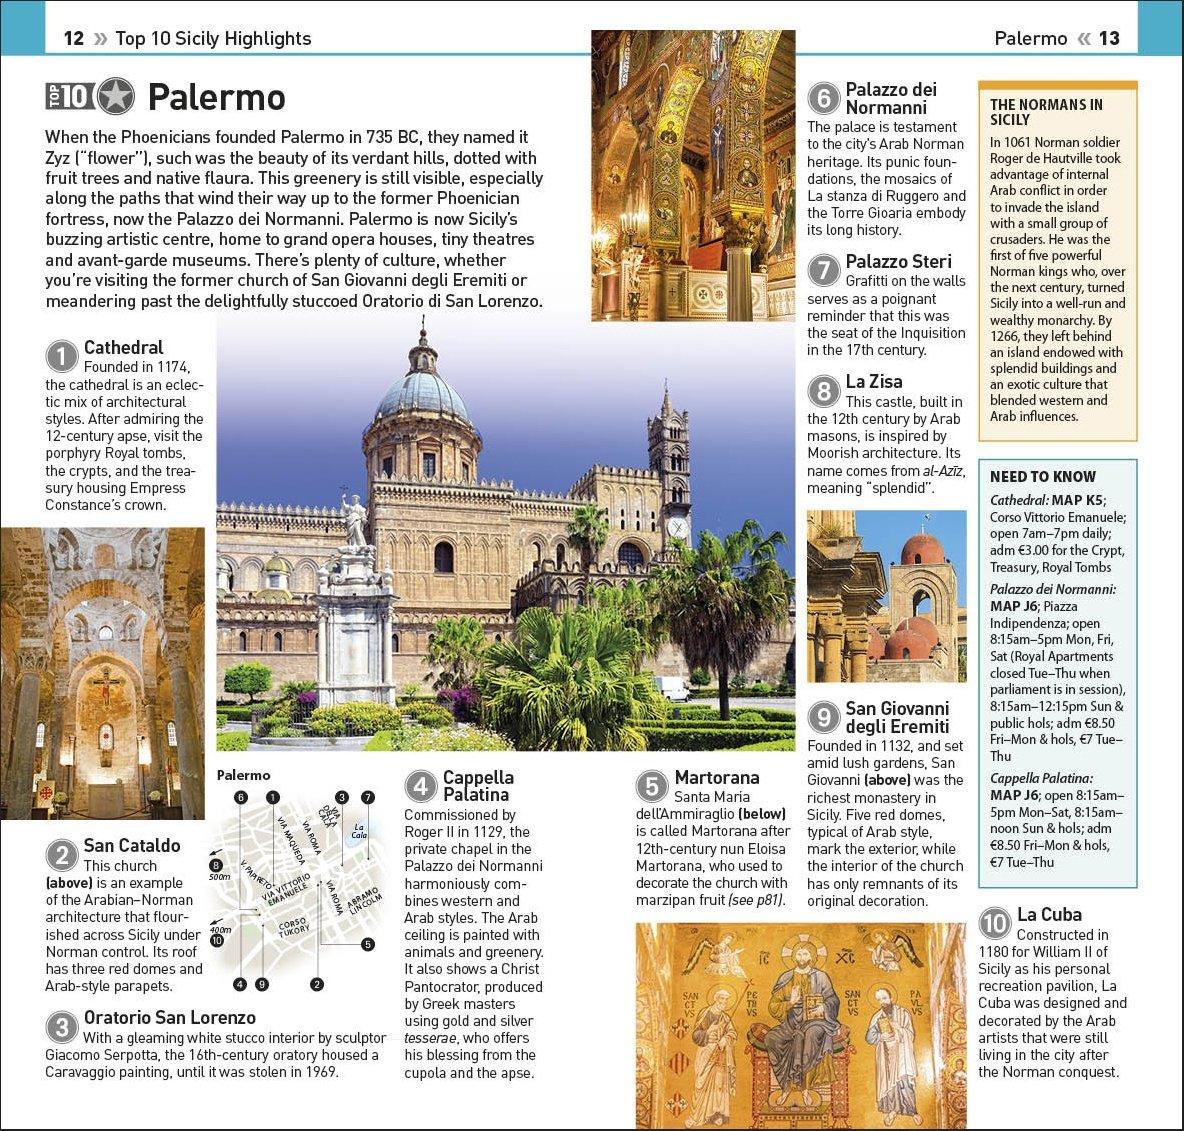 Top 10 Sicily (DK Eyewitness Travel Guide): DK Travel